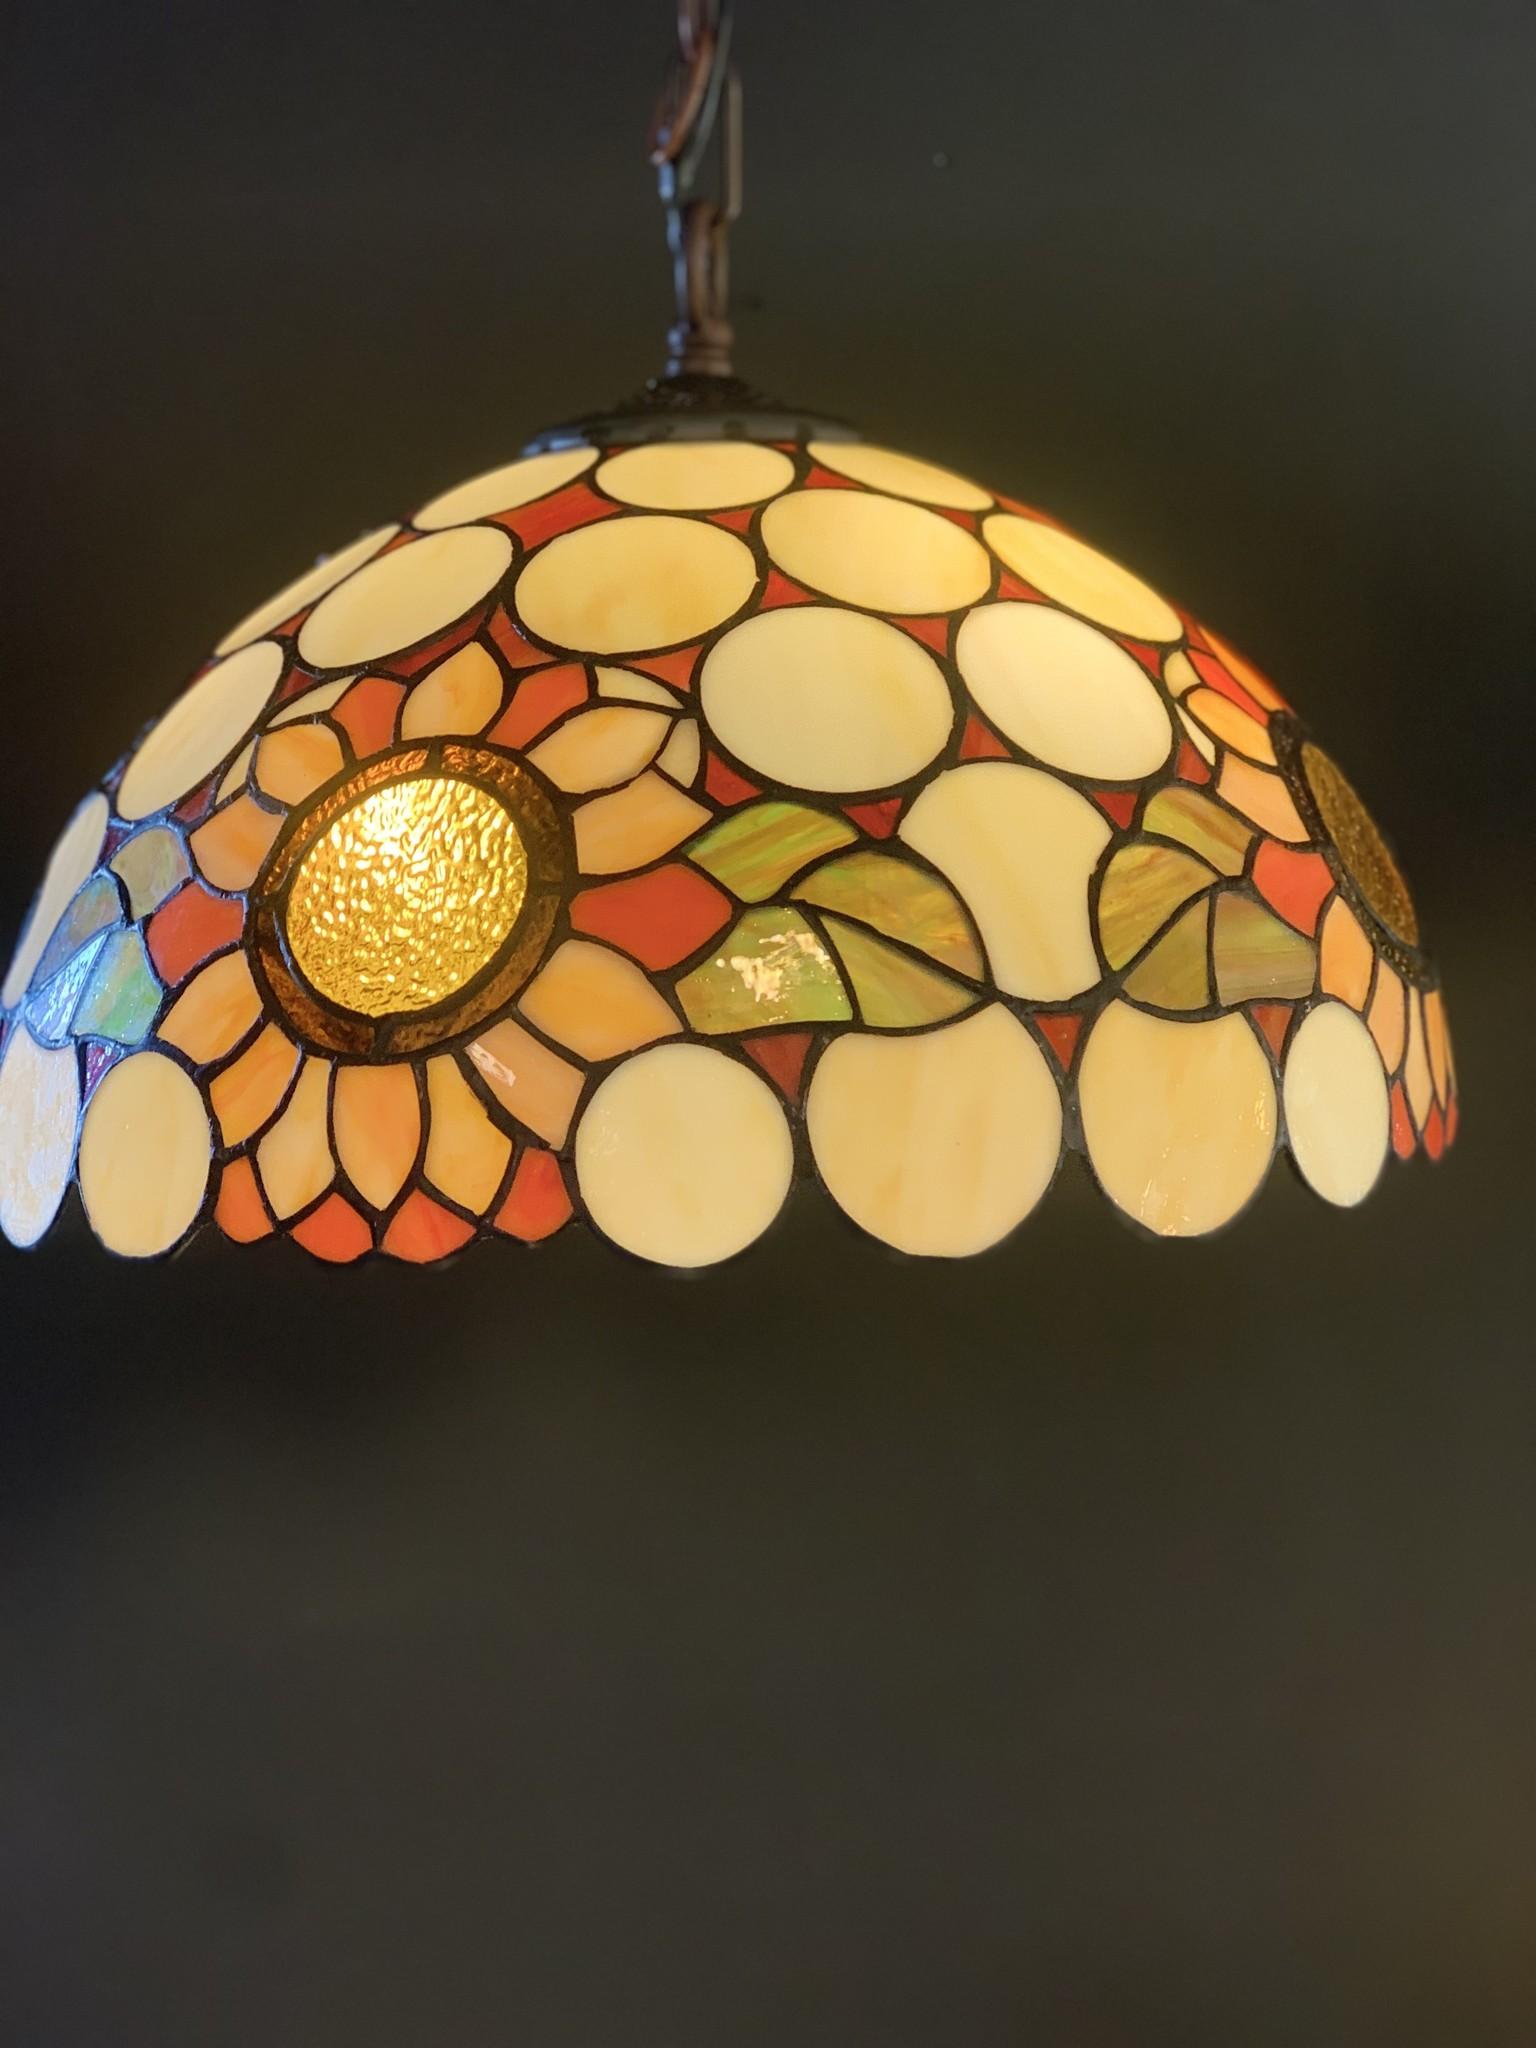 RoMaLux D10022 Tiffany Hanglamp